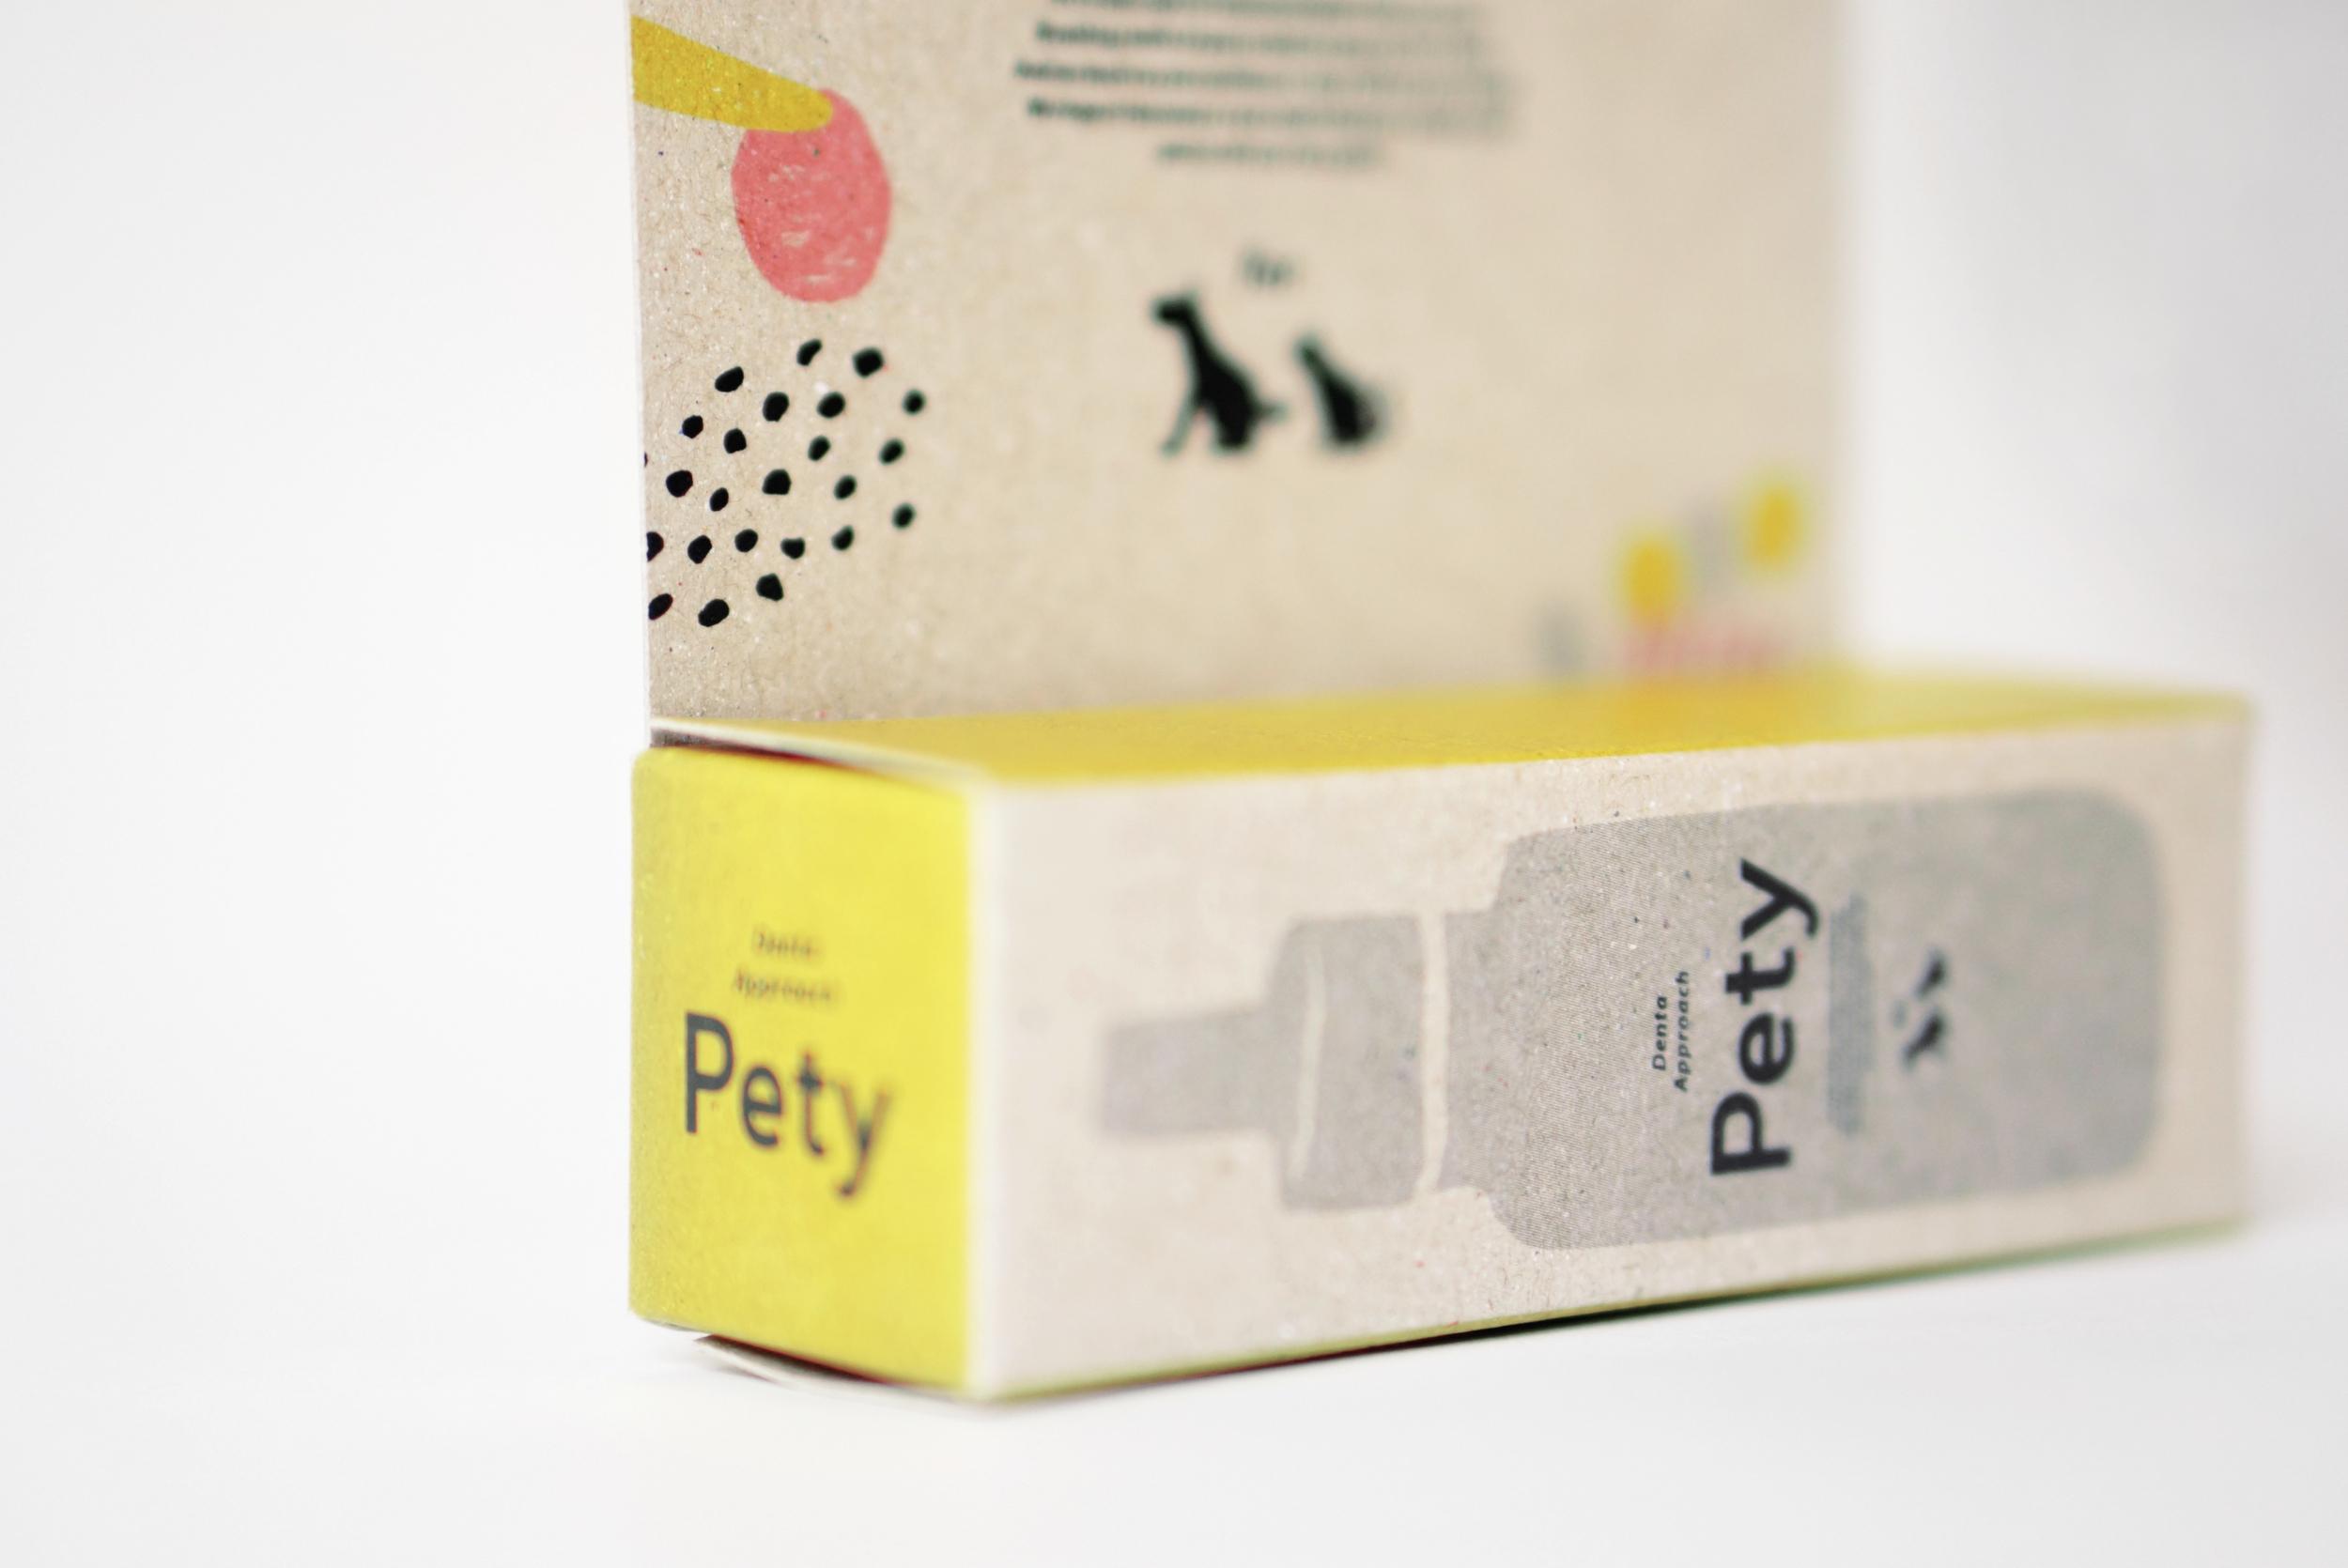 pety_5.jpg